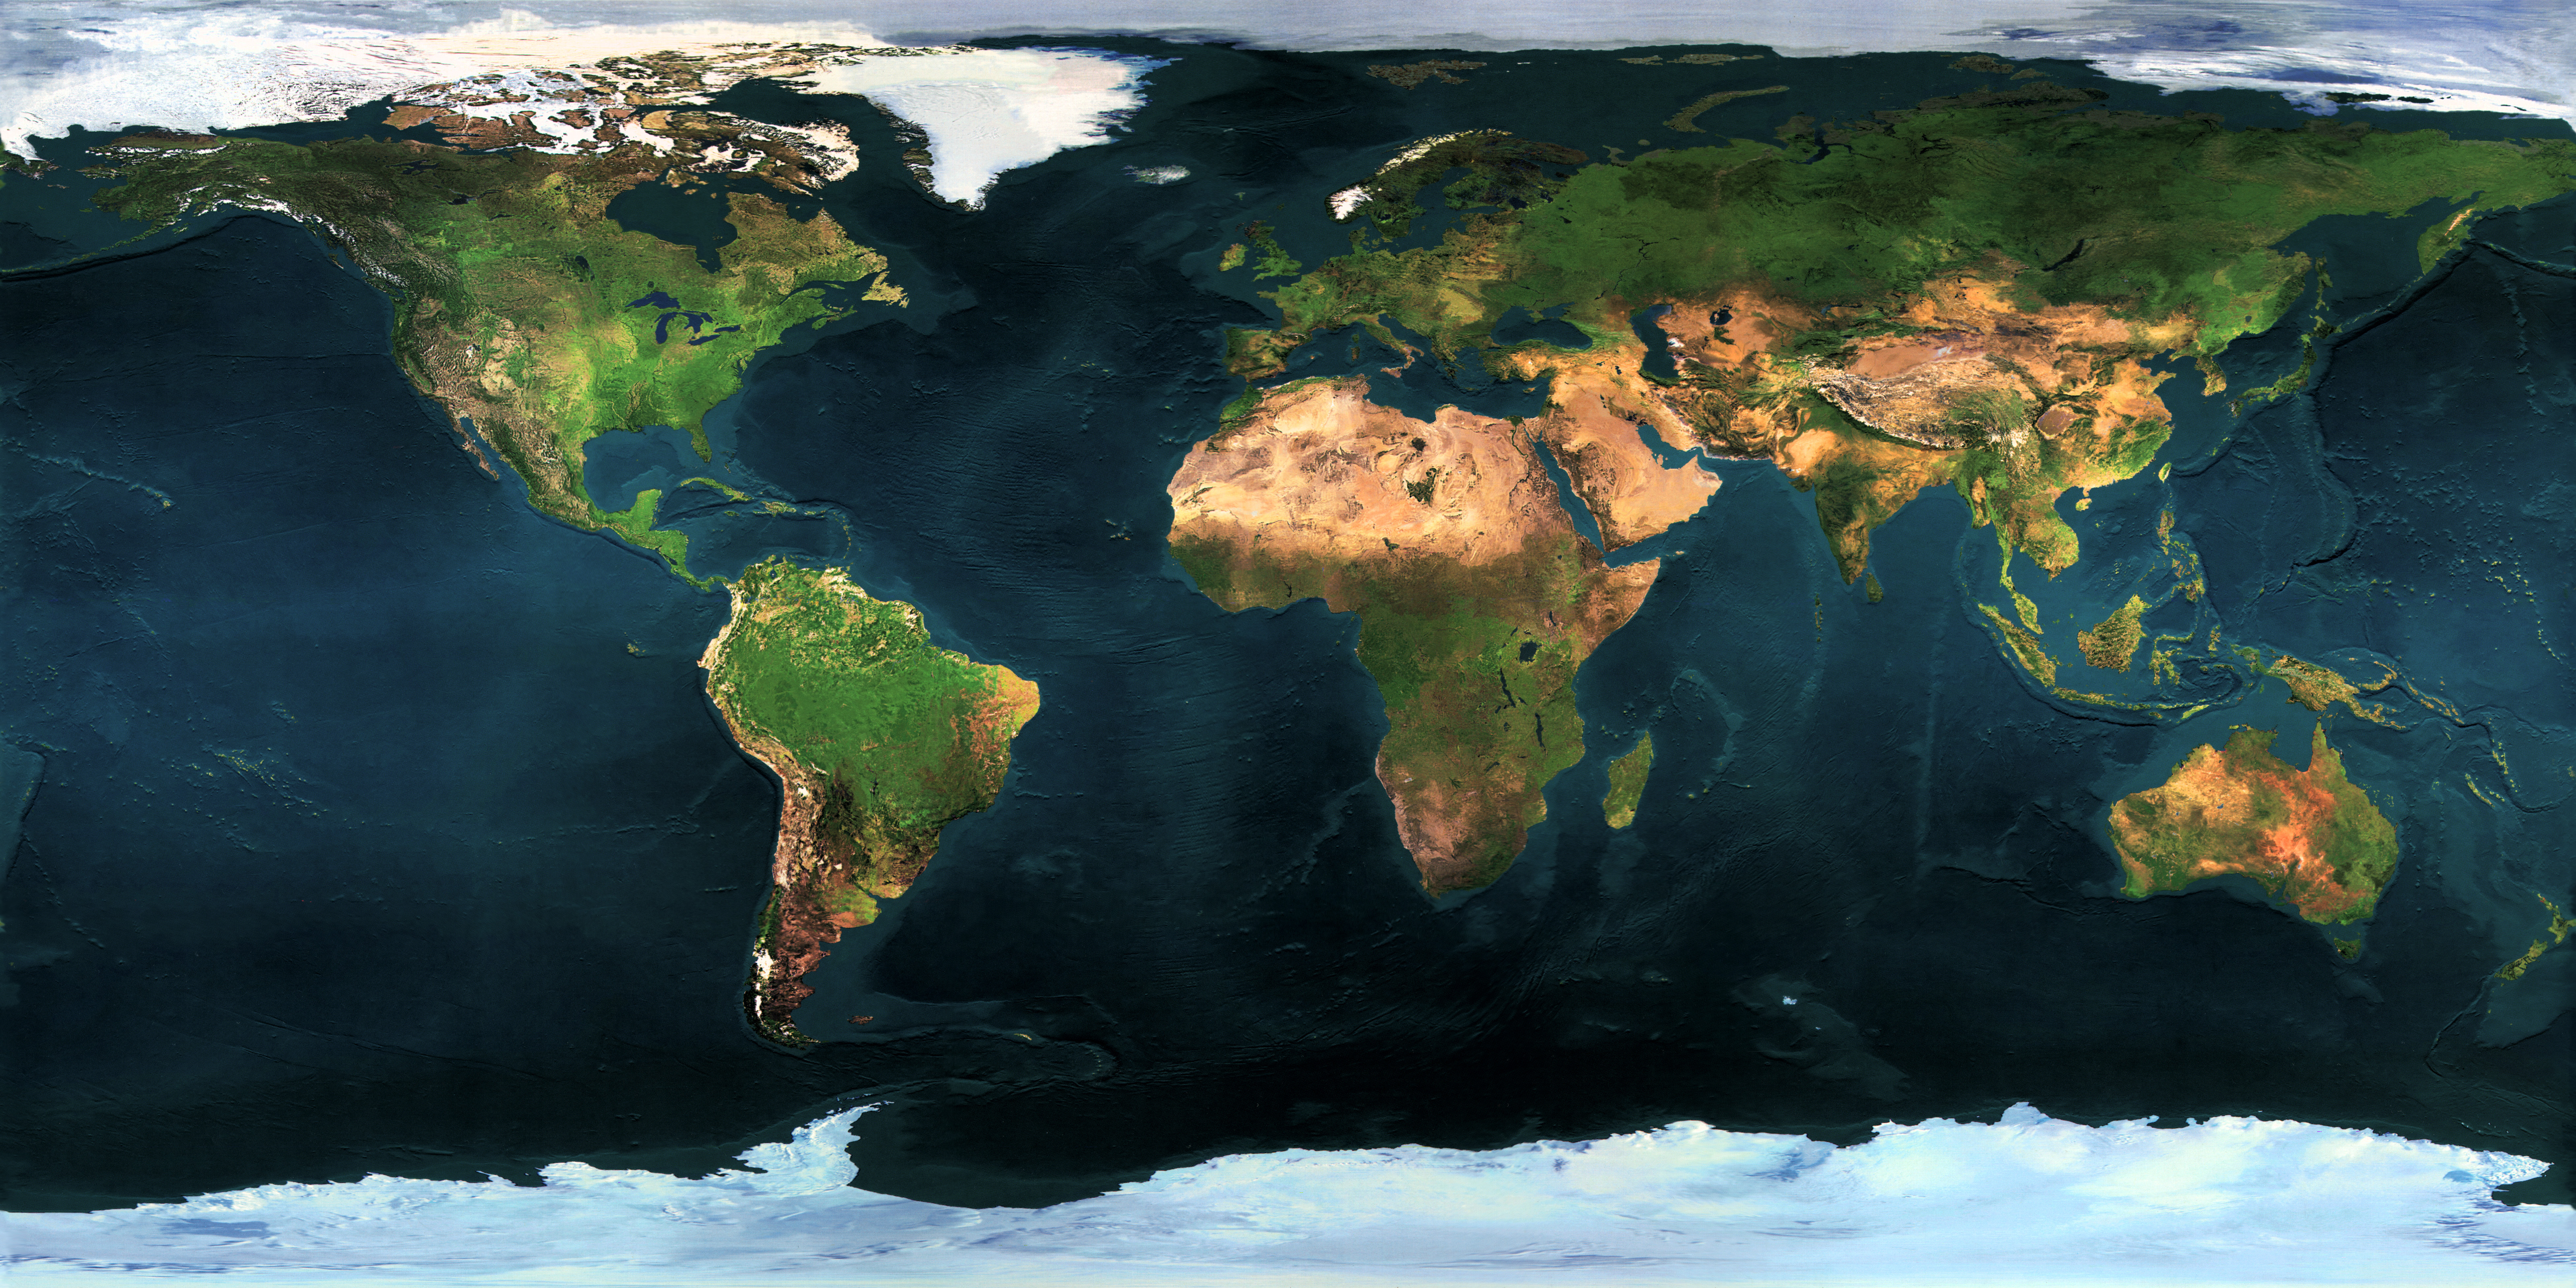 earth satellite map earth satellite mapjpg 6400x3200